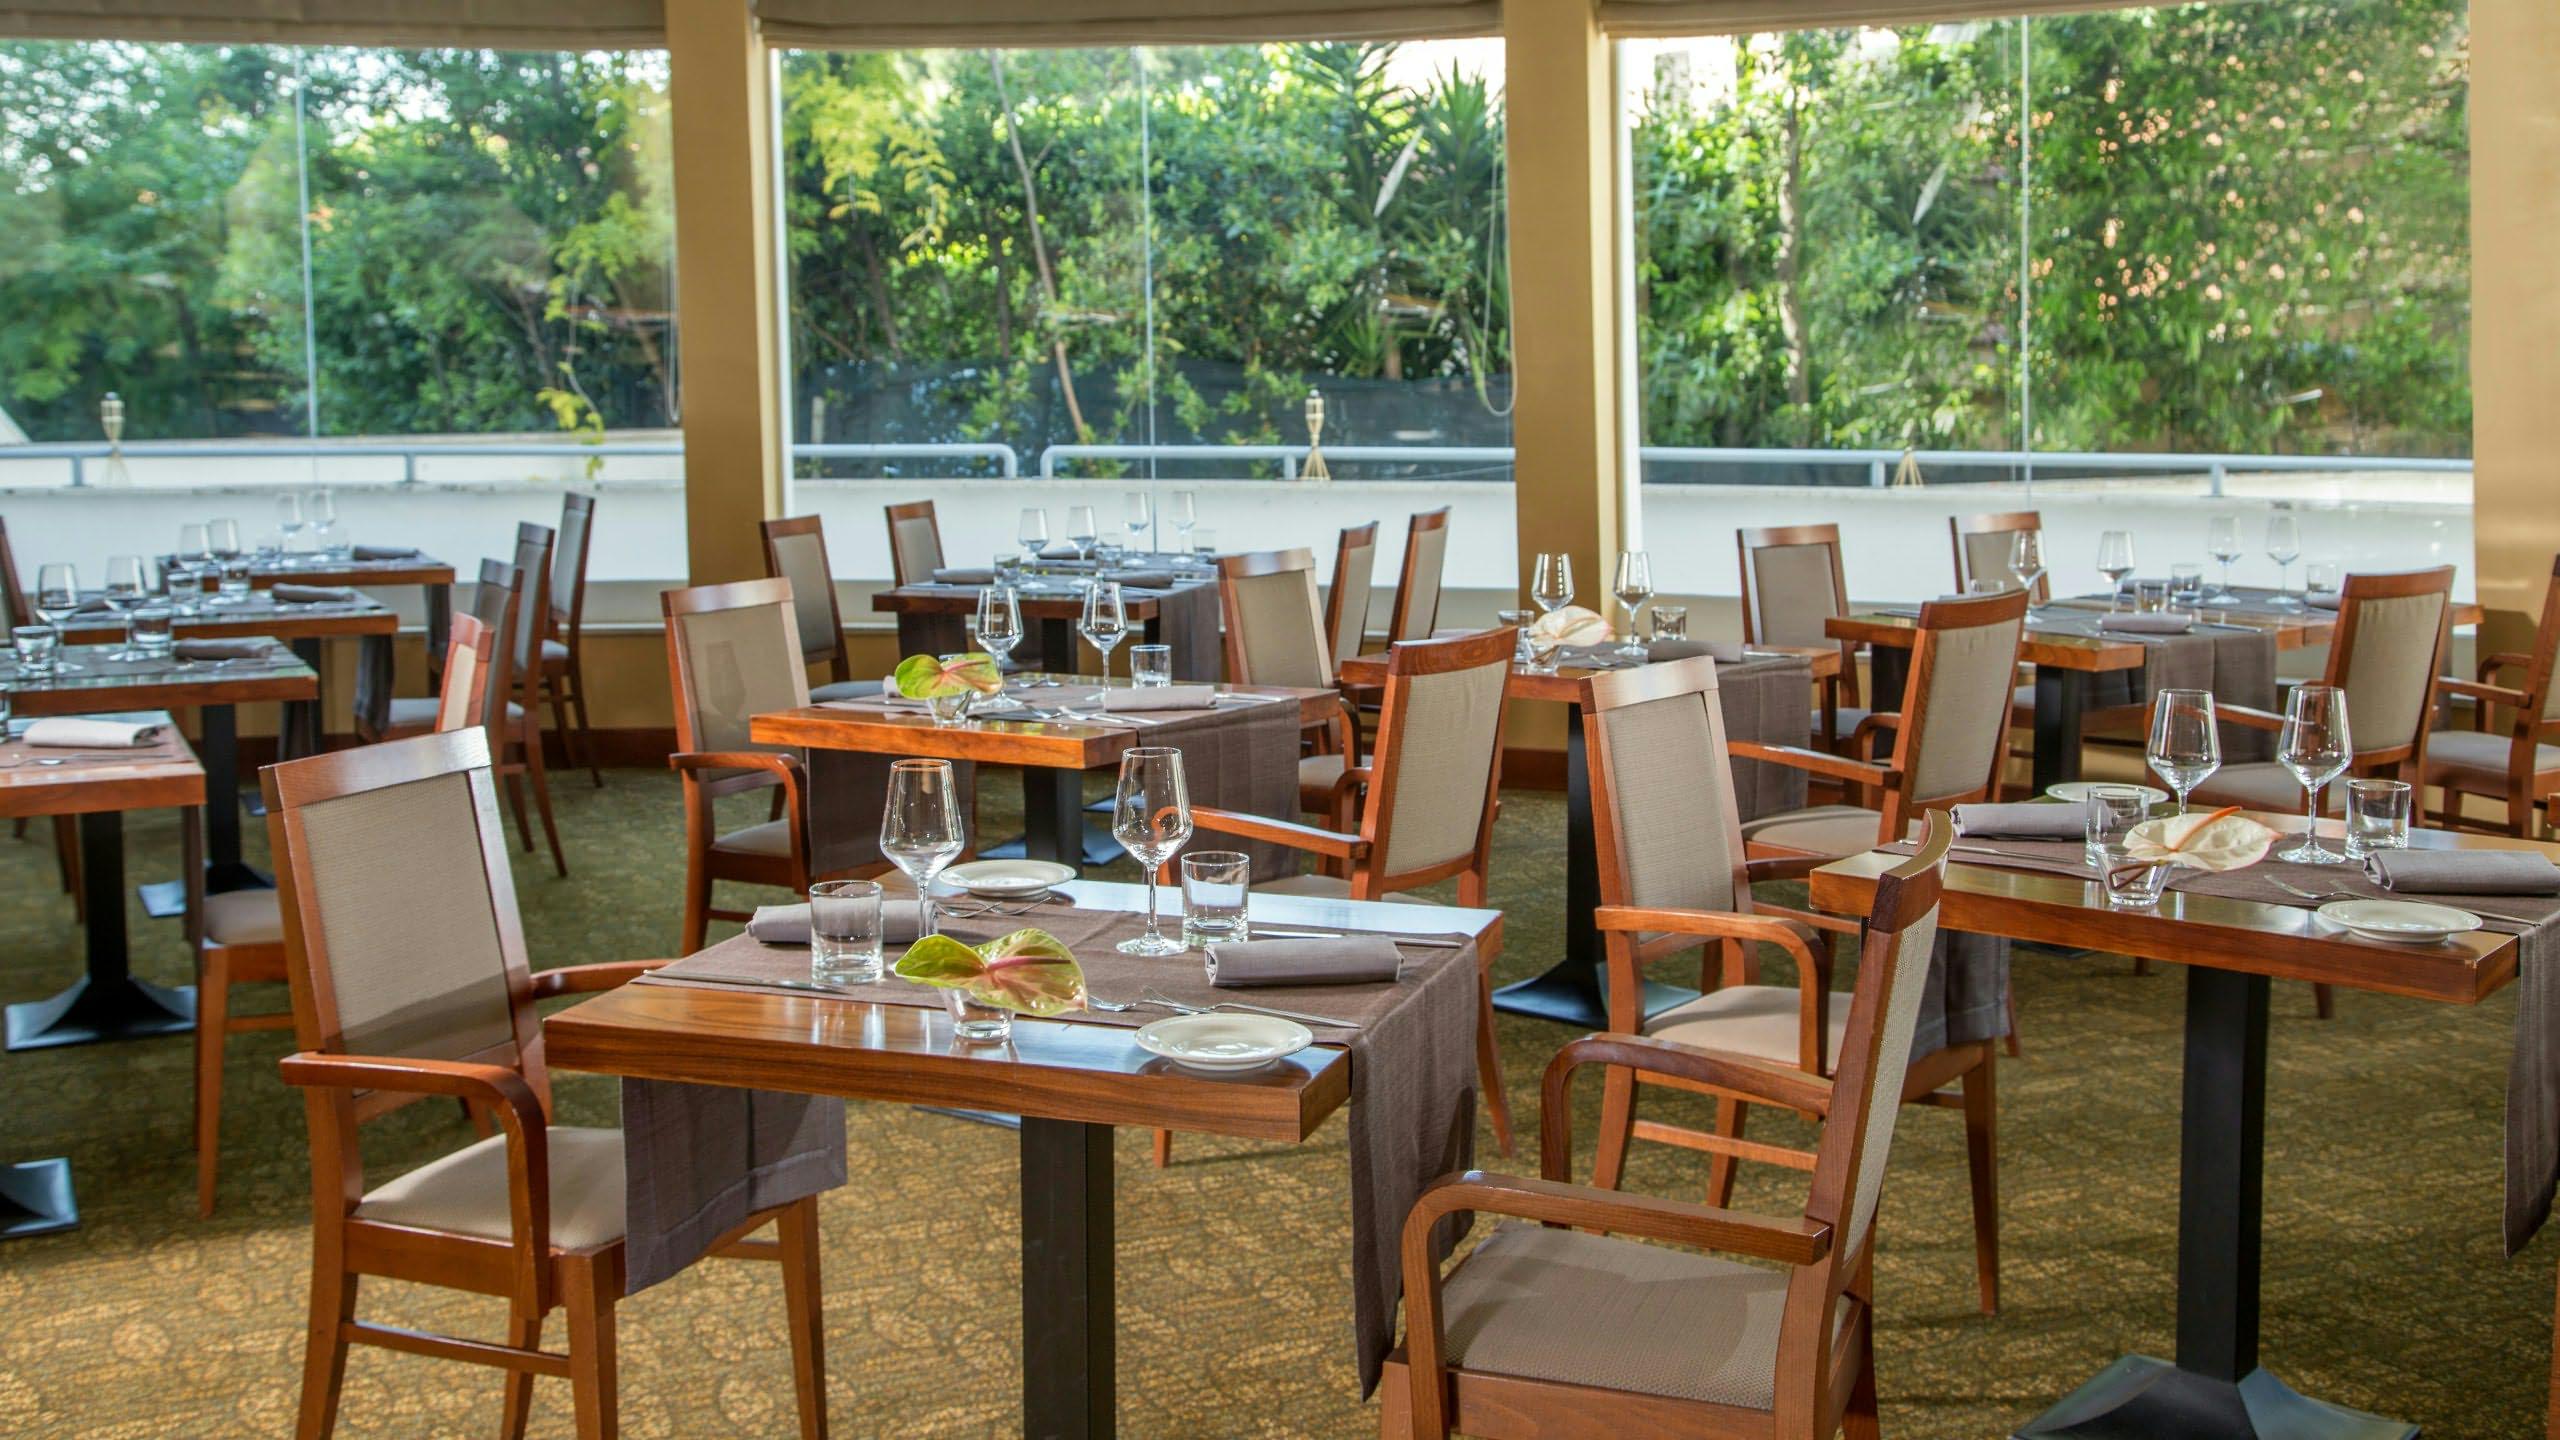 hotel-capannelle-rome-commonareas-10